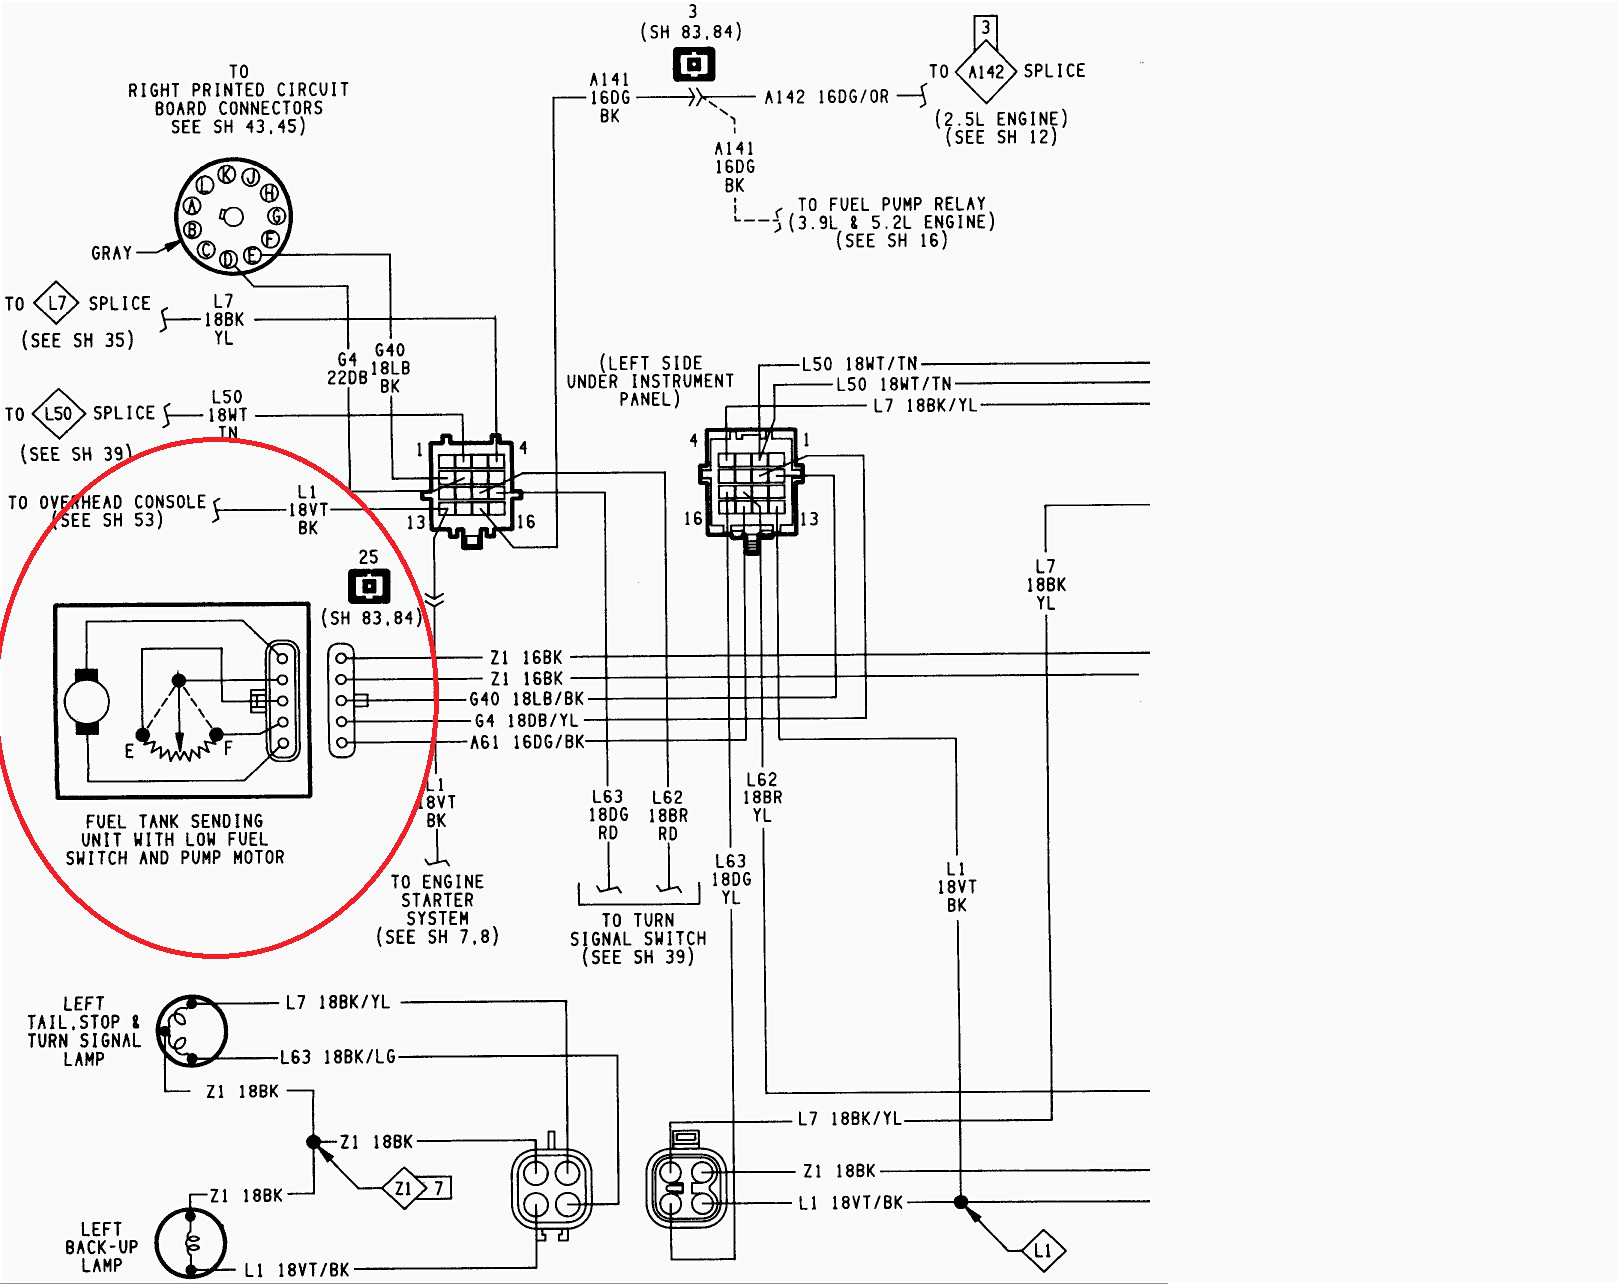 Ford F 150 Fuel Gauge Wiring Diagram - Wiring Diagram Data - Fuel Gauge Sending Unit Wiring Diagram